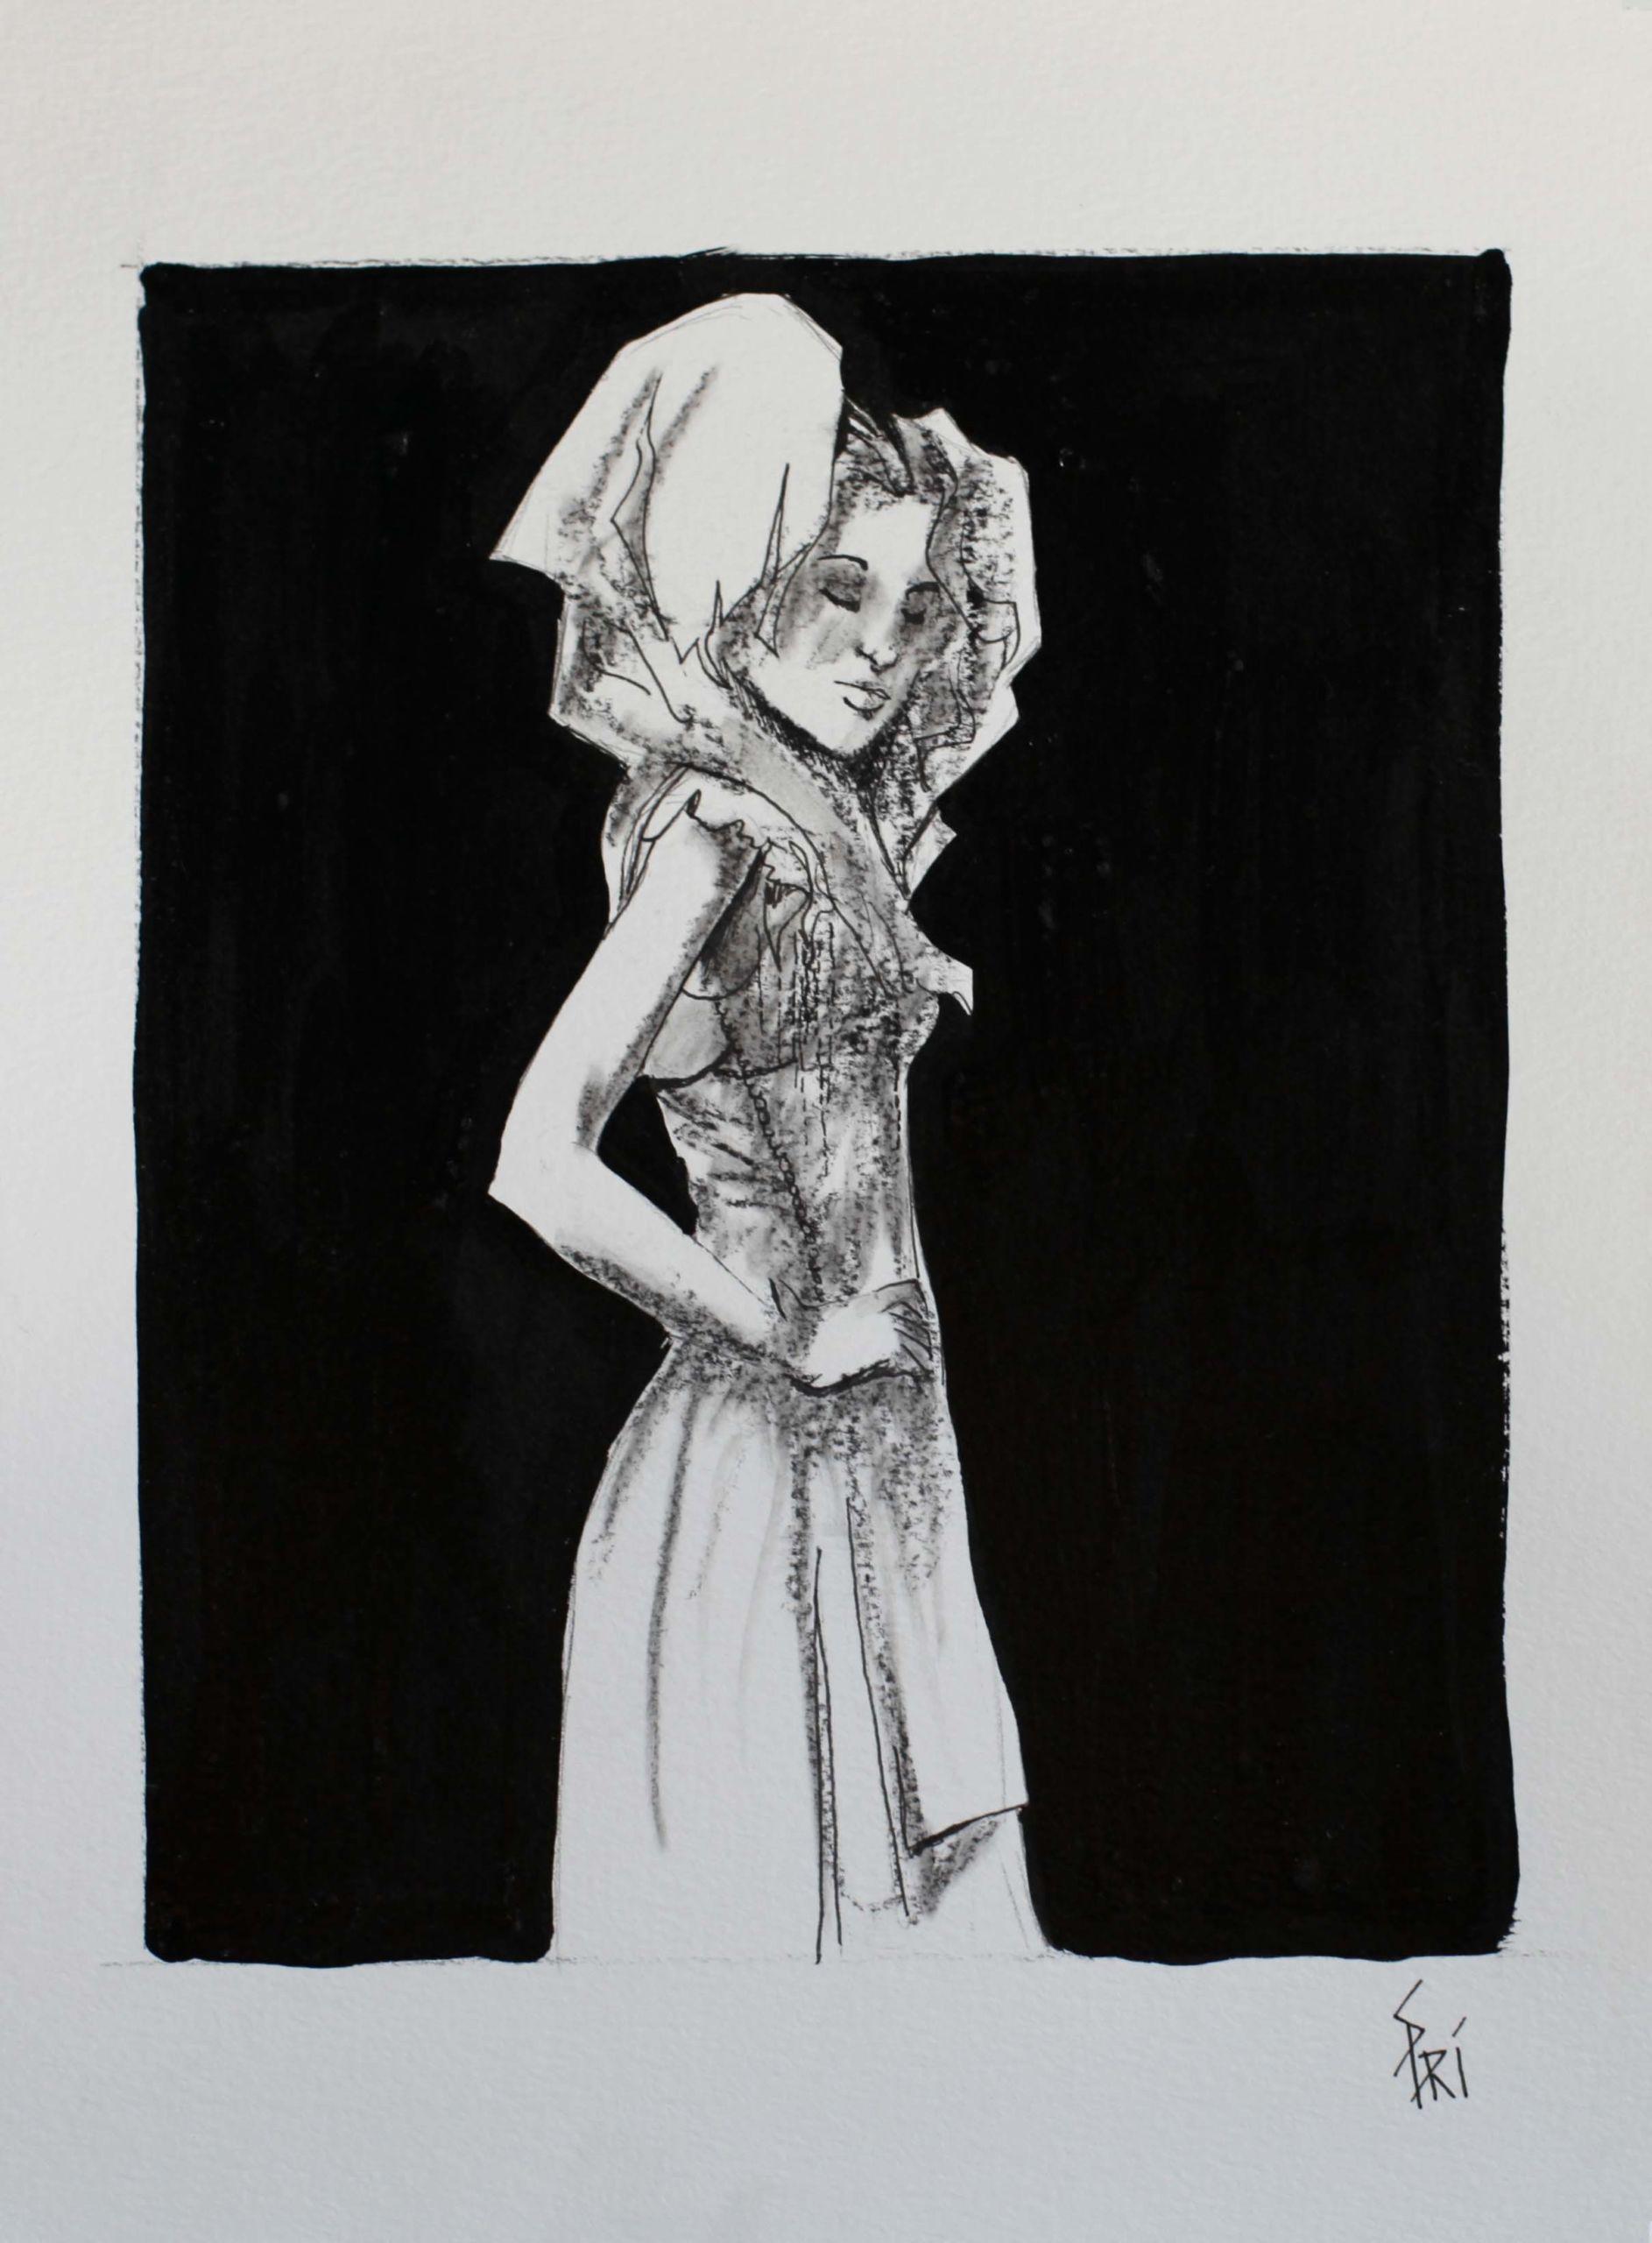 Encre de chine par la dessinatrice Priscilla Seiller-Mandereau